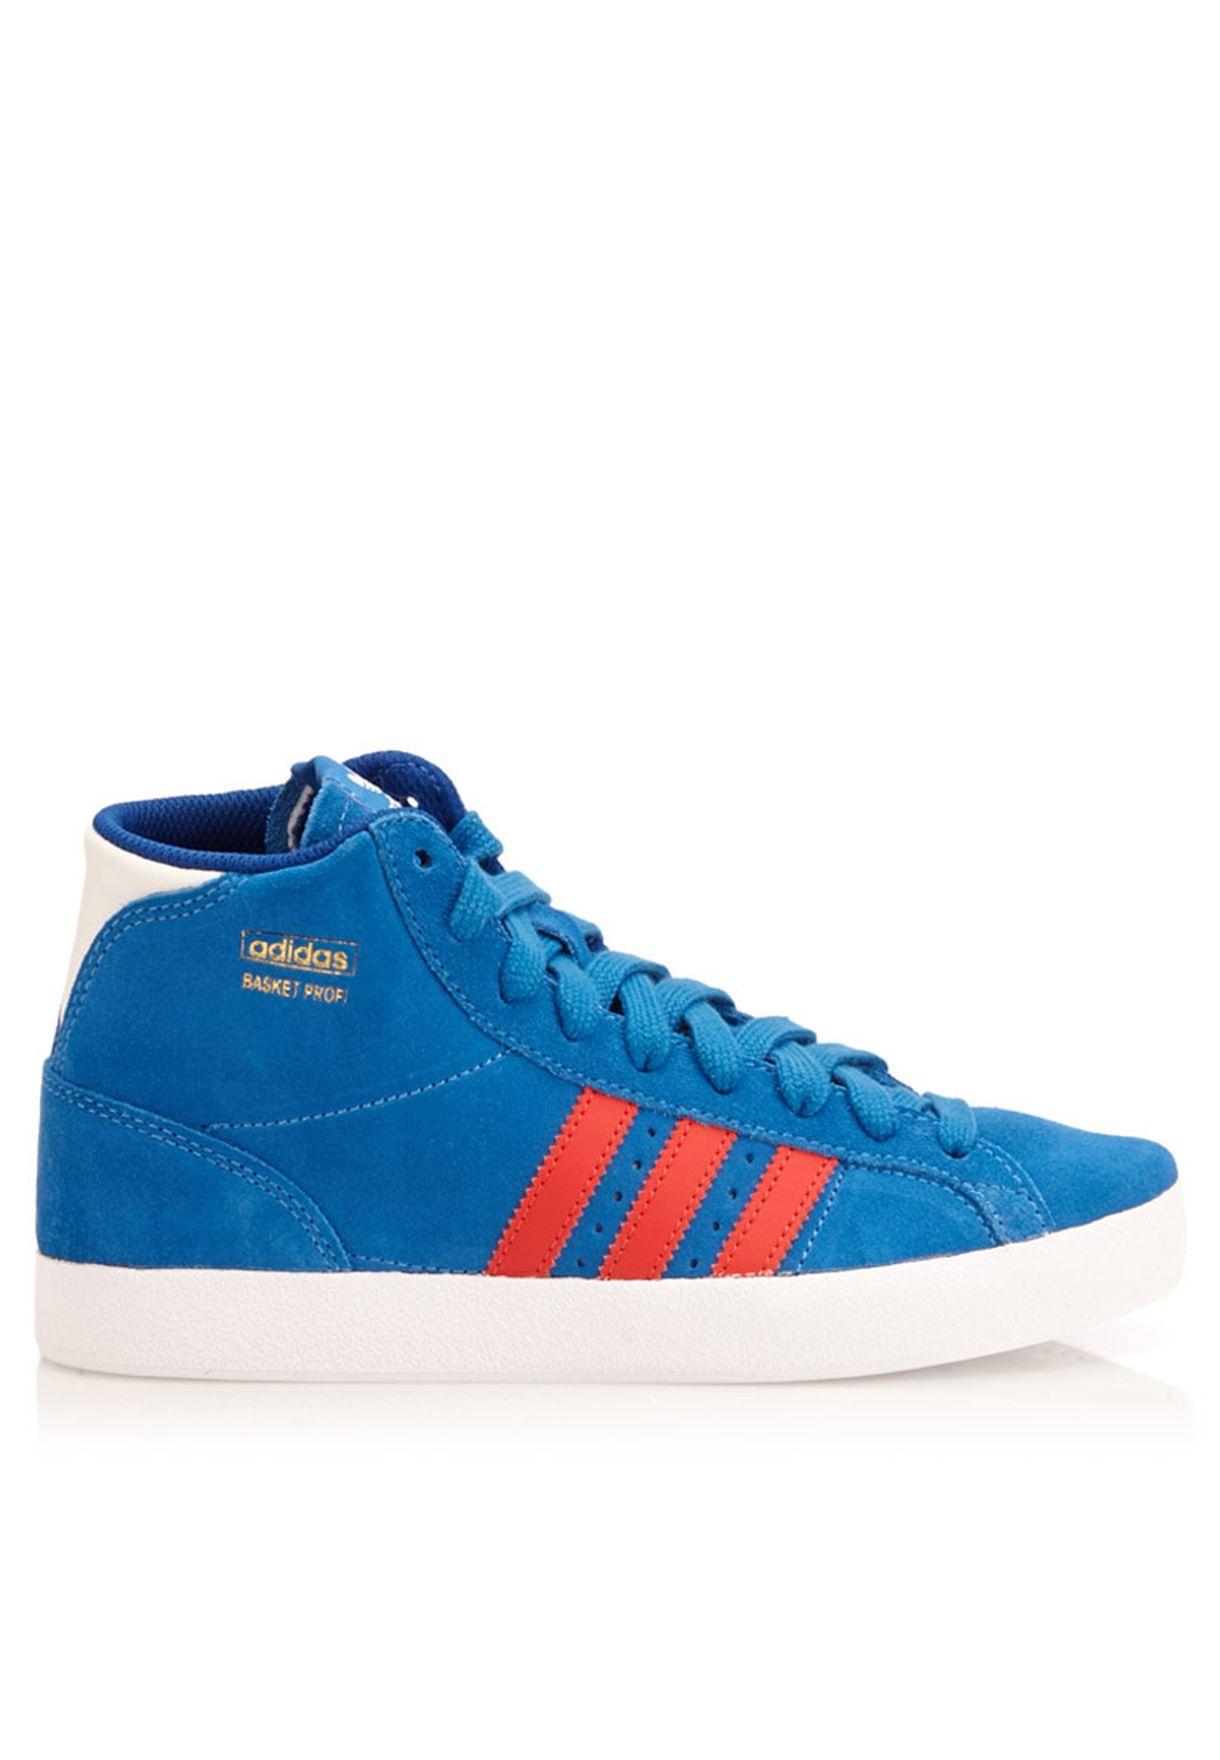 low priced 937ac a667f Shop adidas Originals blue Basket Profi M25180 for Kids in Qatar ...